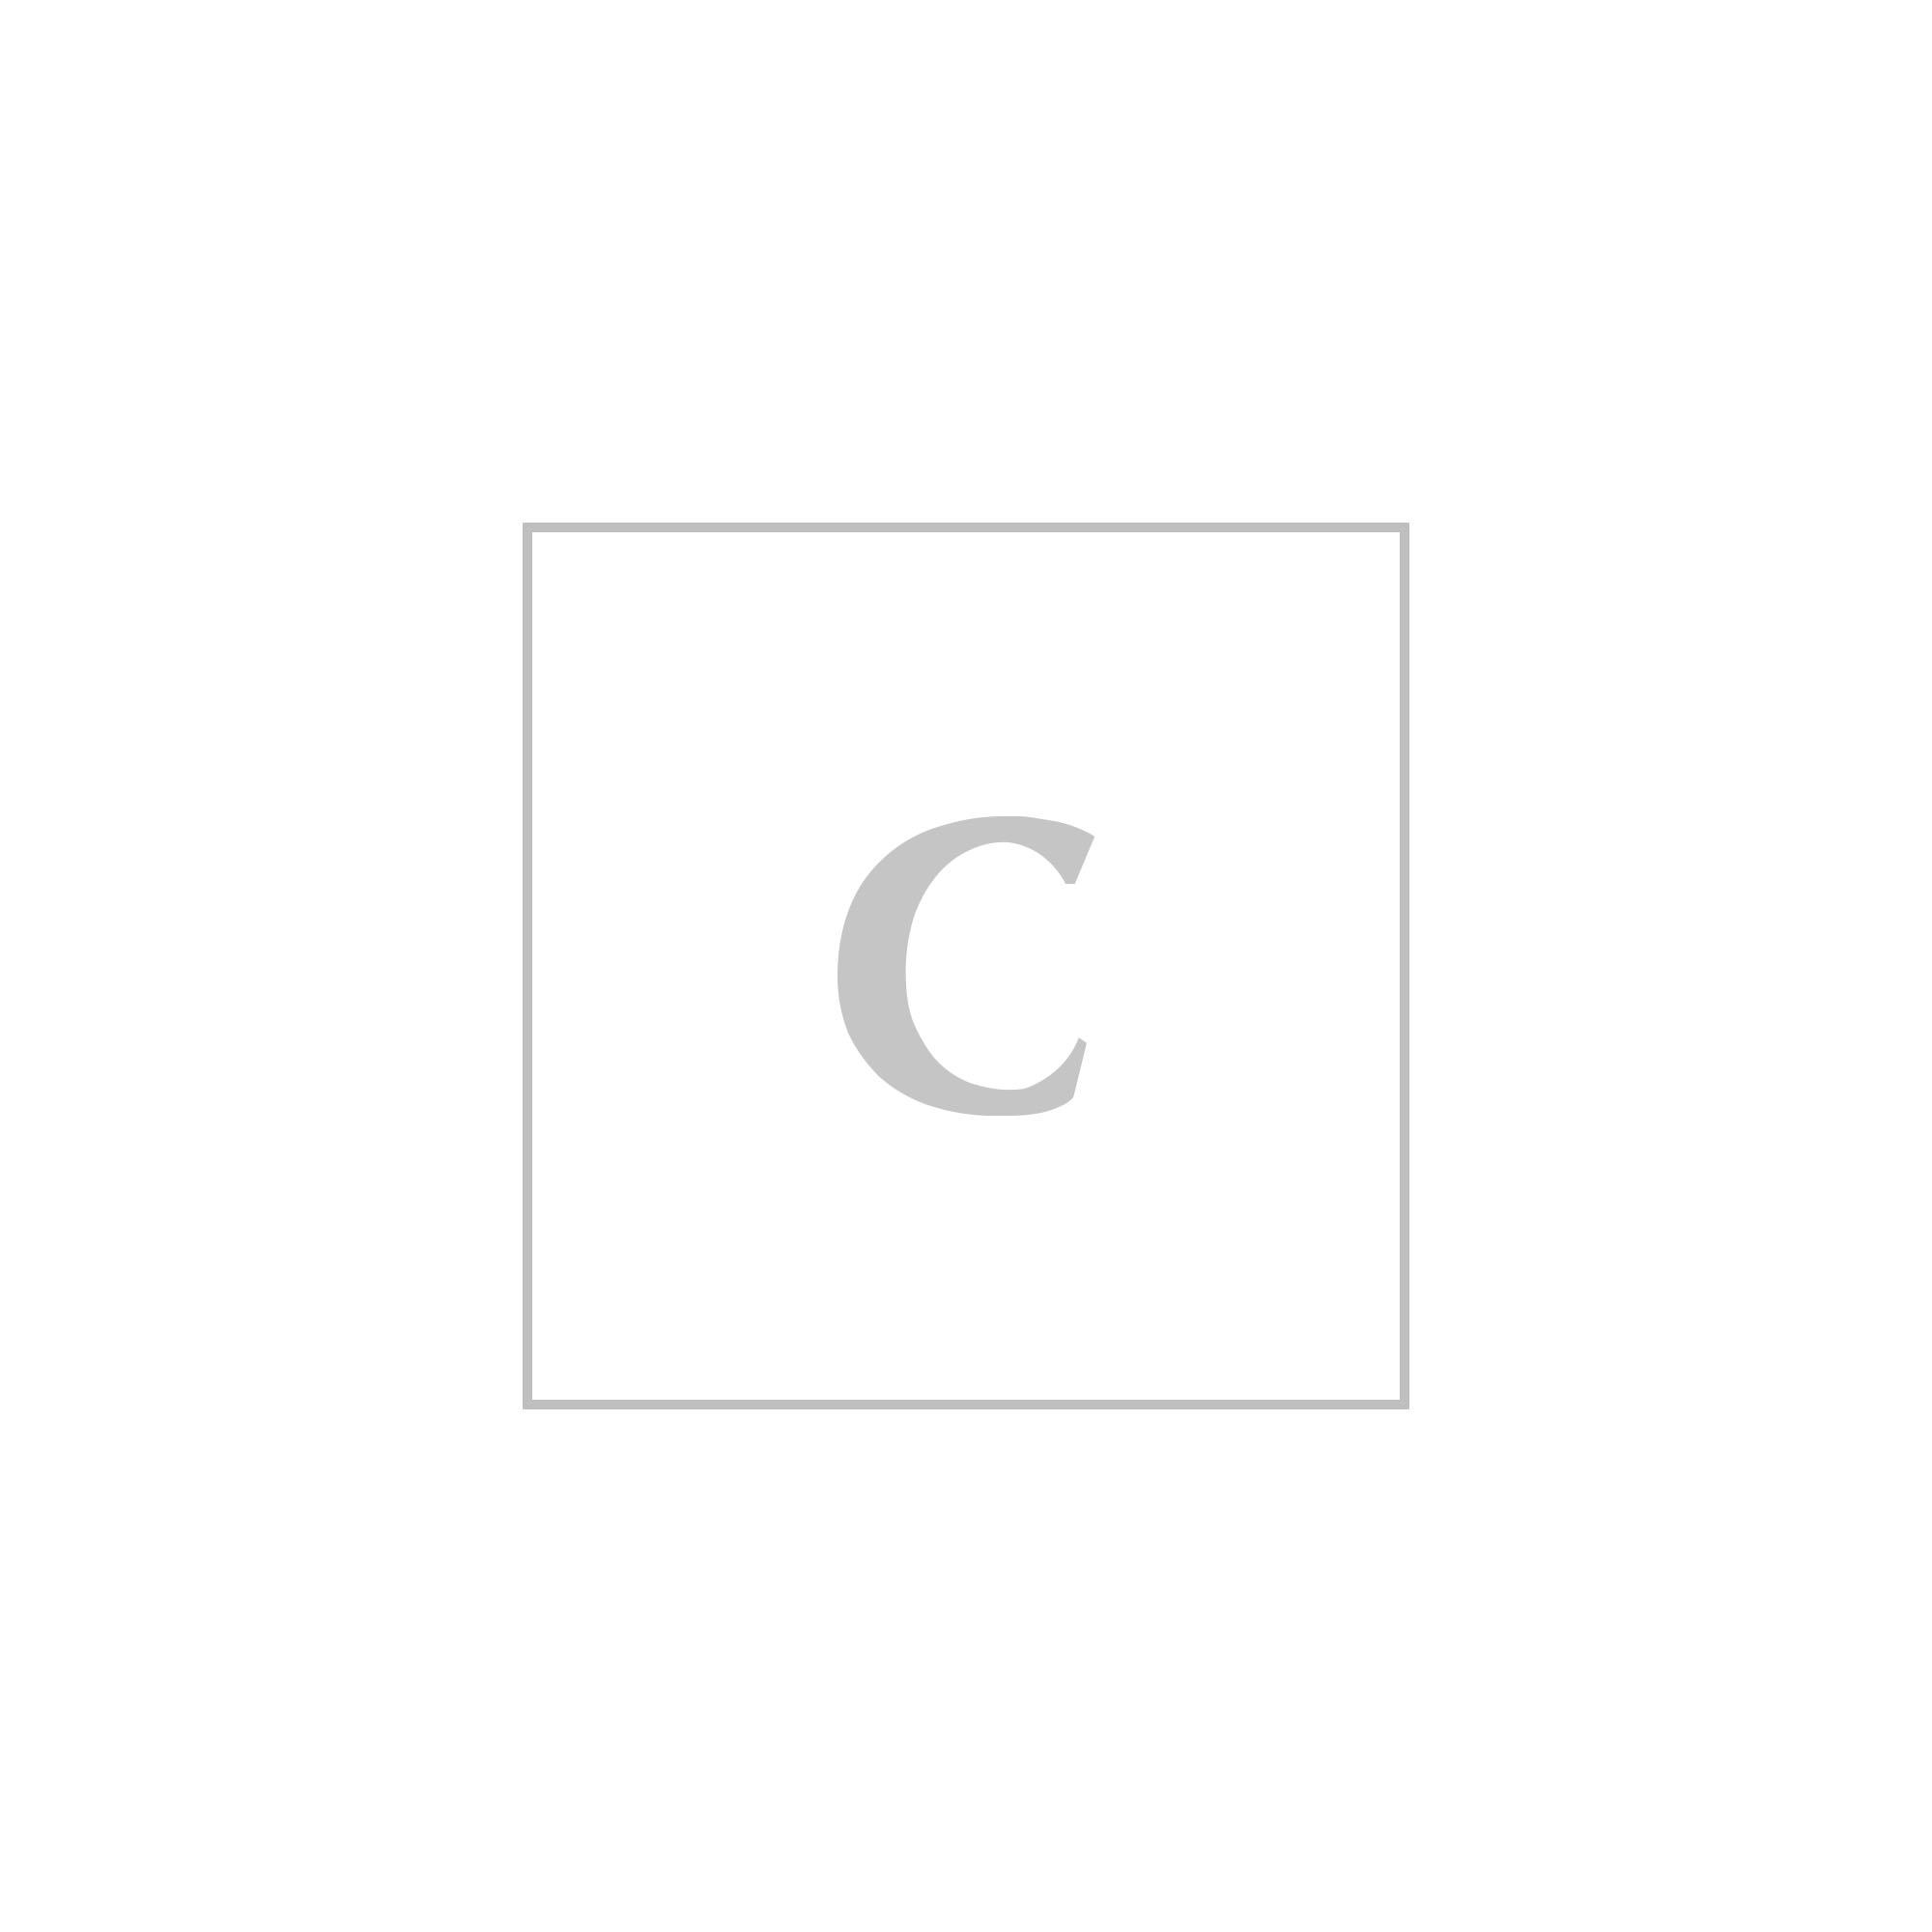 Burberry mantella collet